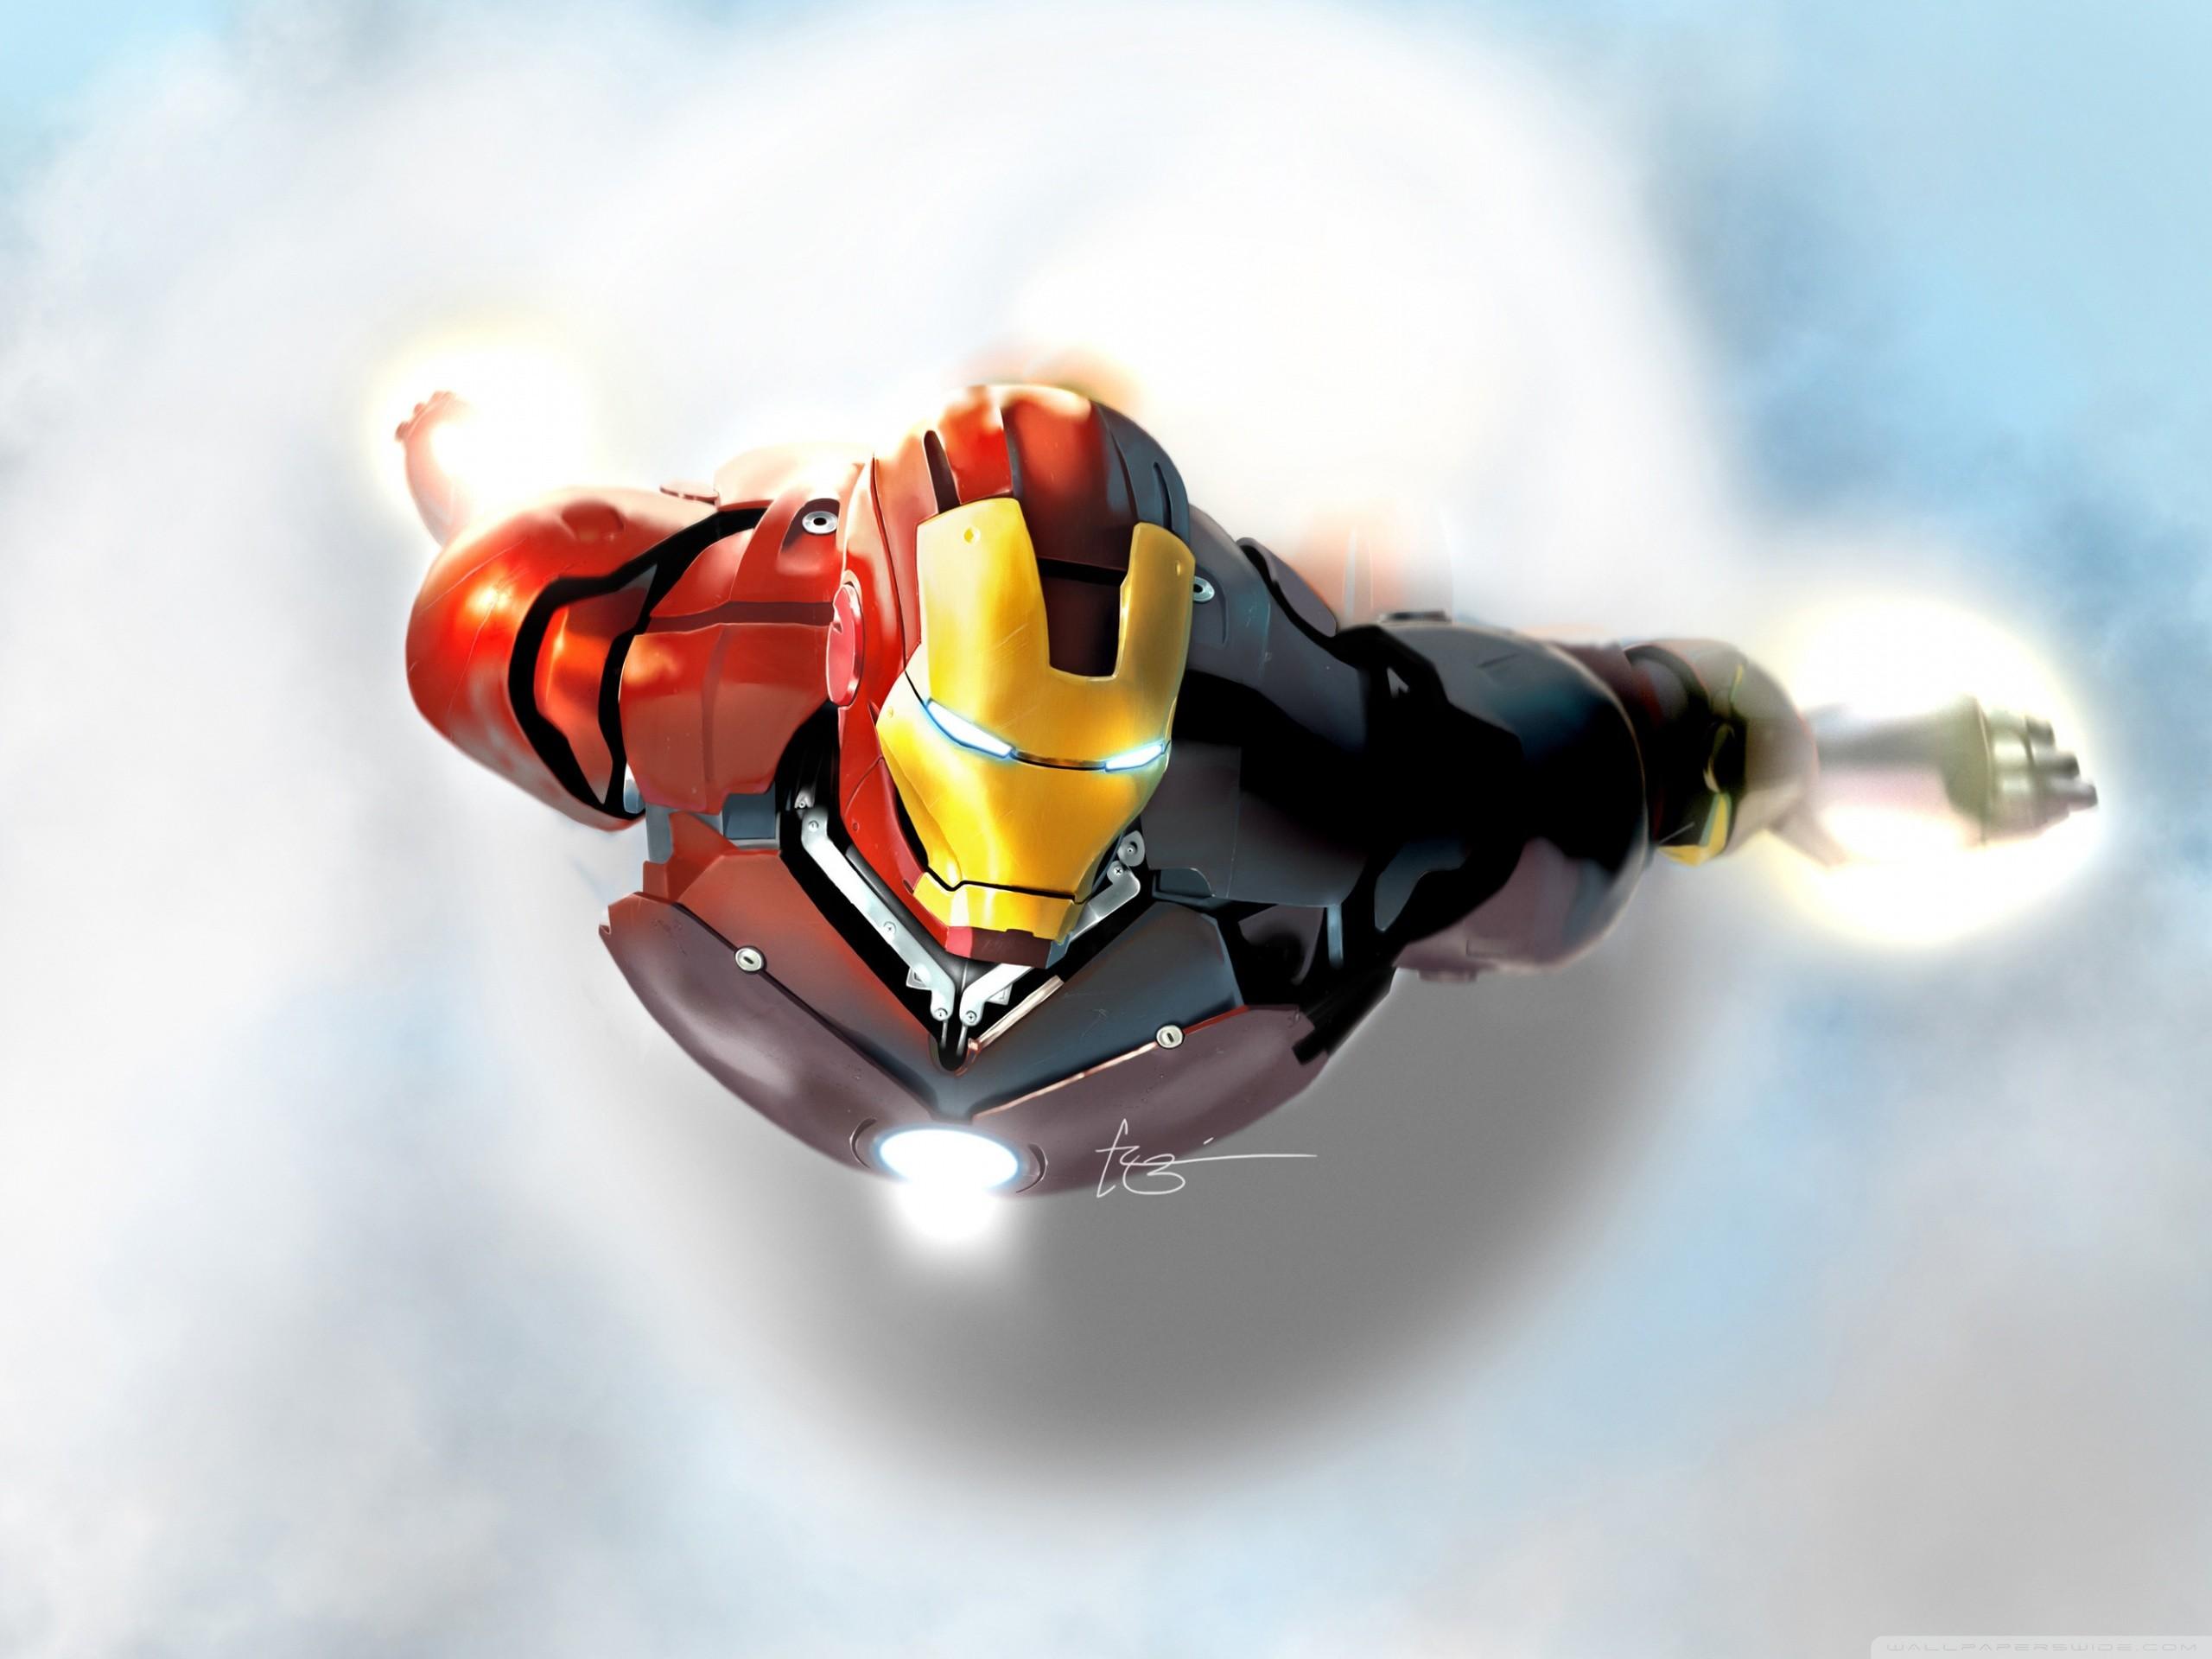 Iron Man In Flight HD Wide Wallpaper for Widescreen